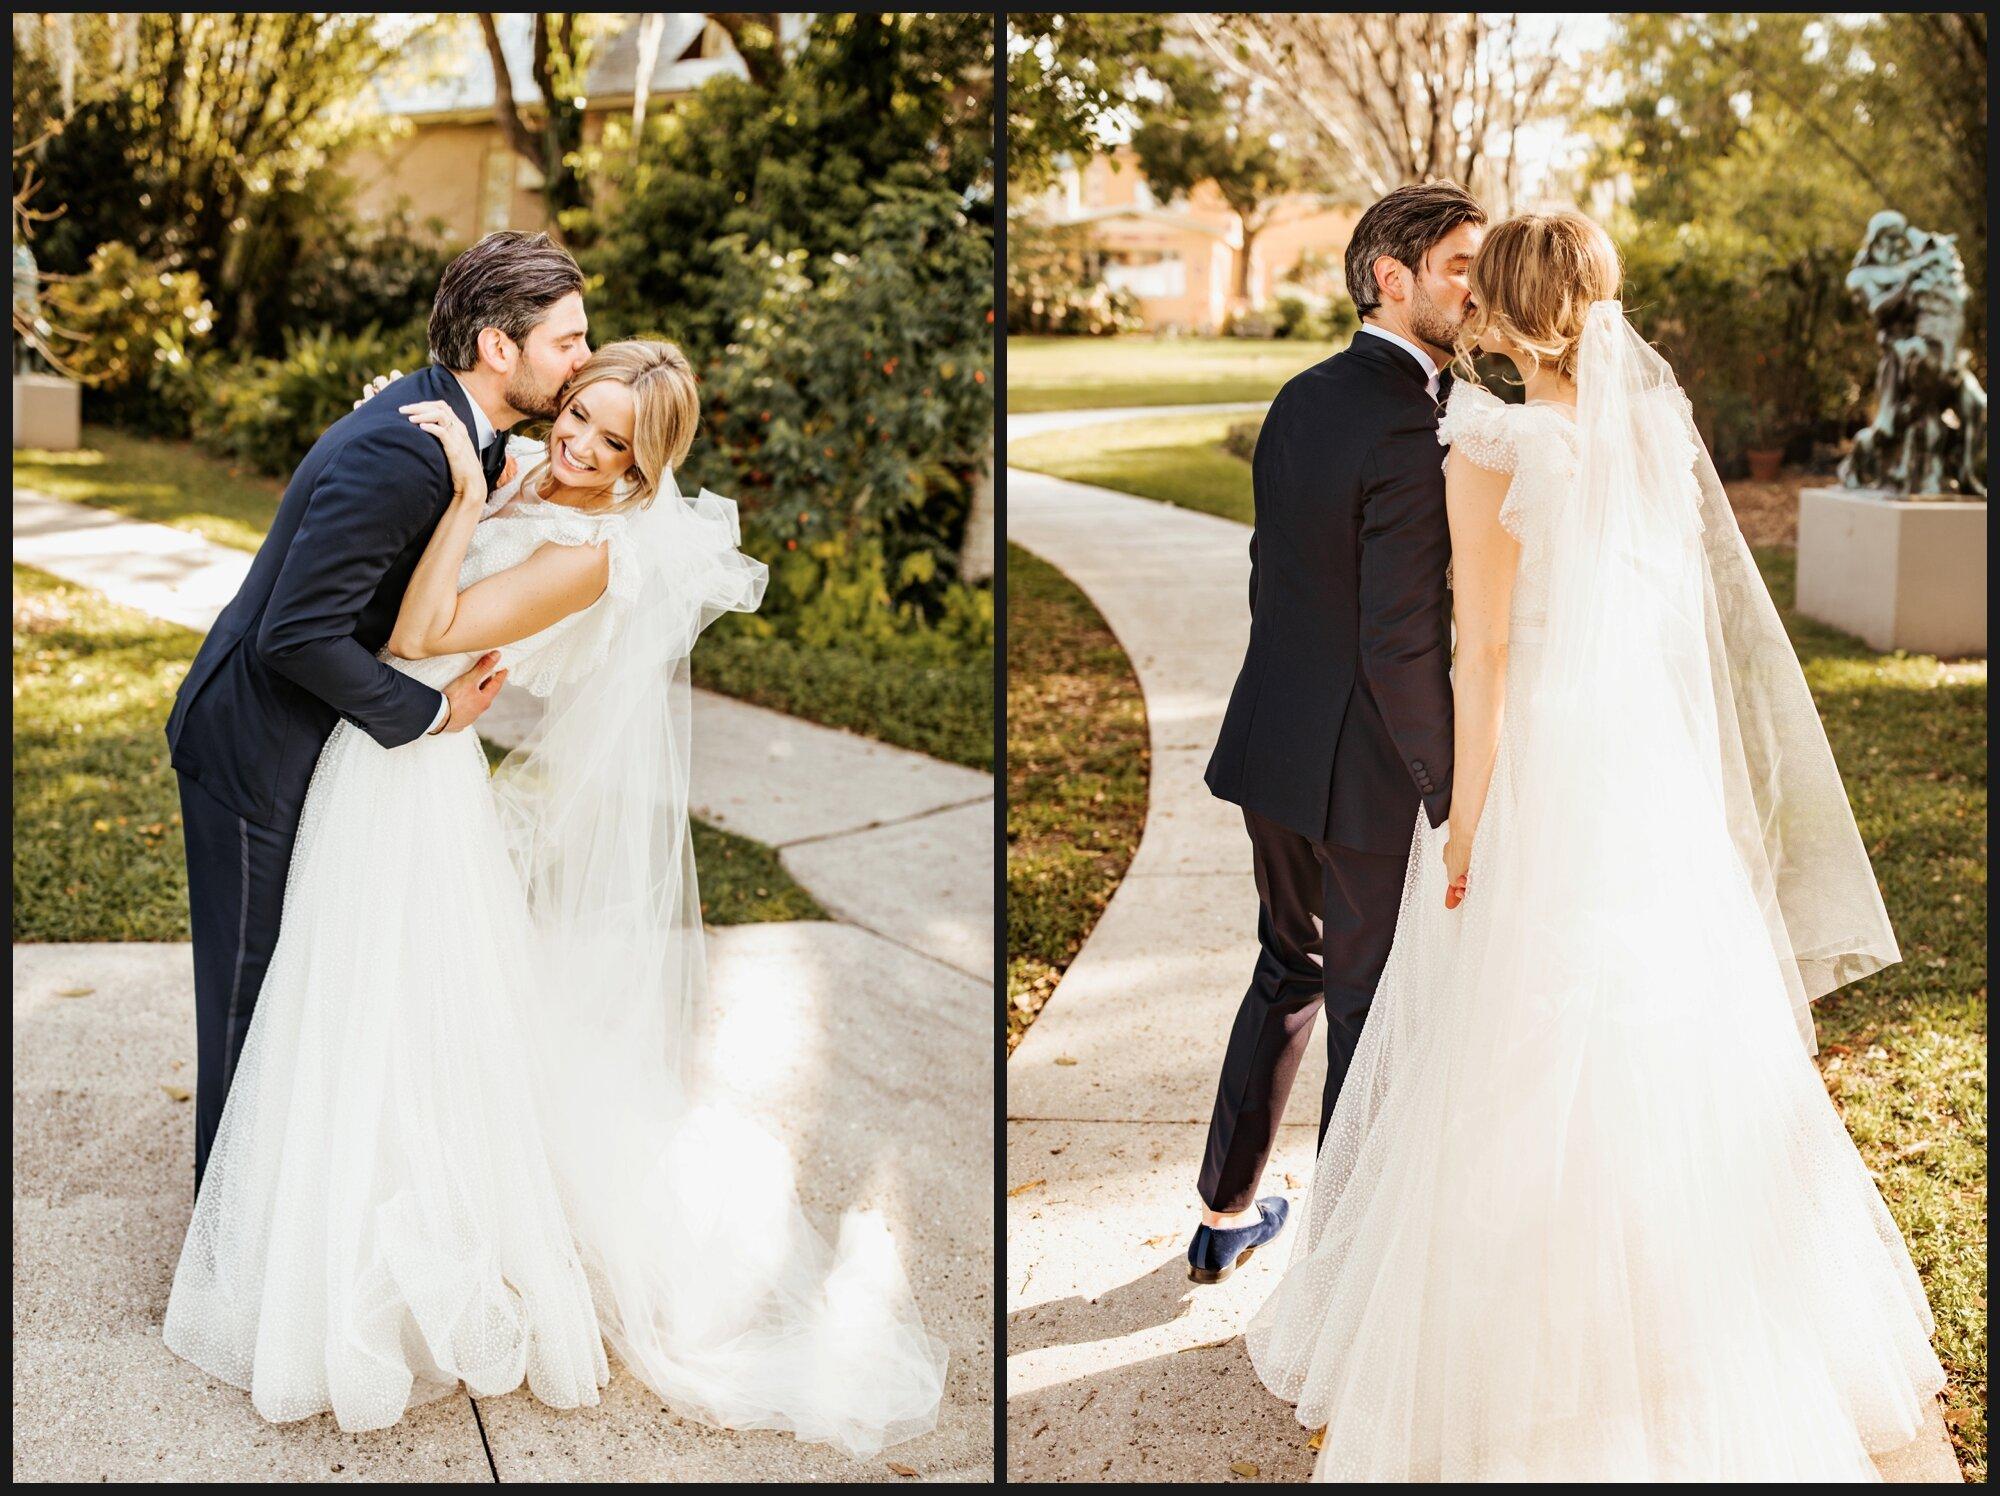 Orlando-Wedding-Photographer-destination-wedding-photographer-florida-wedding-photographer-hawaii-wedding-photographer_0709.jpg